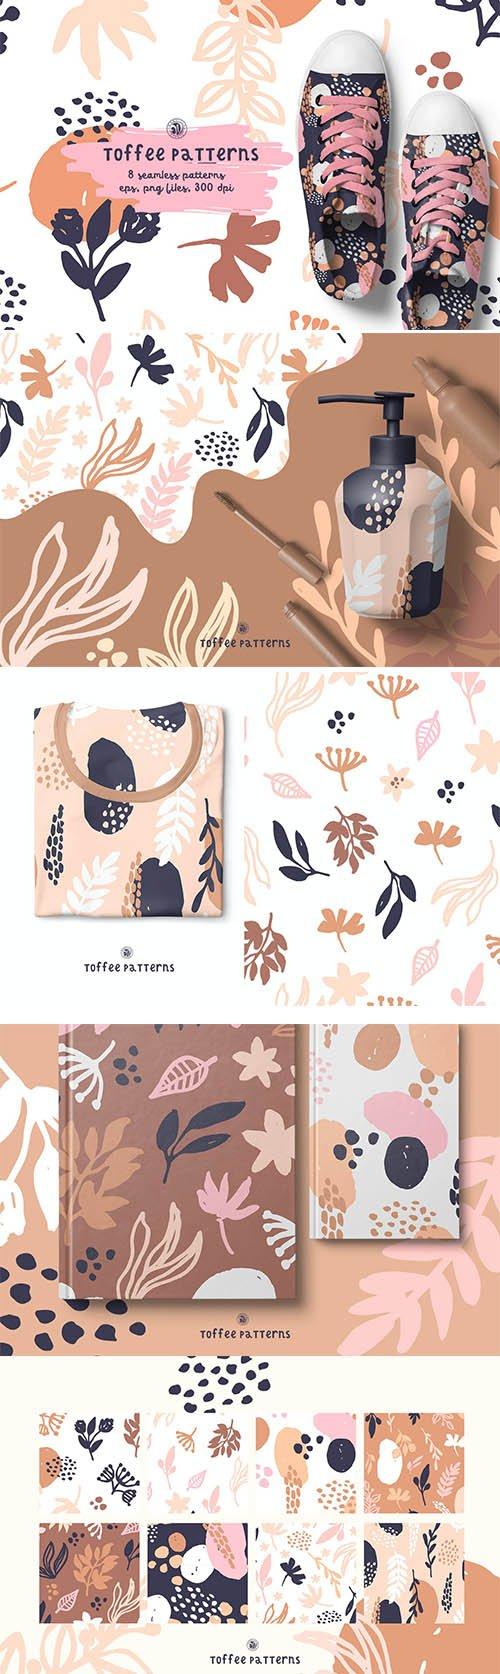 Toffee Patterns